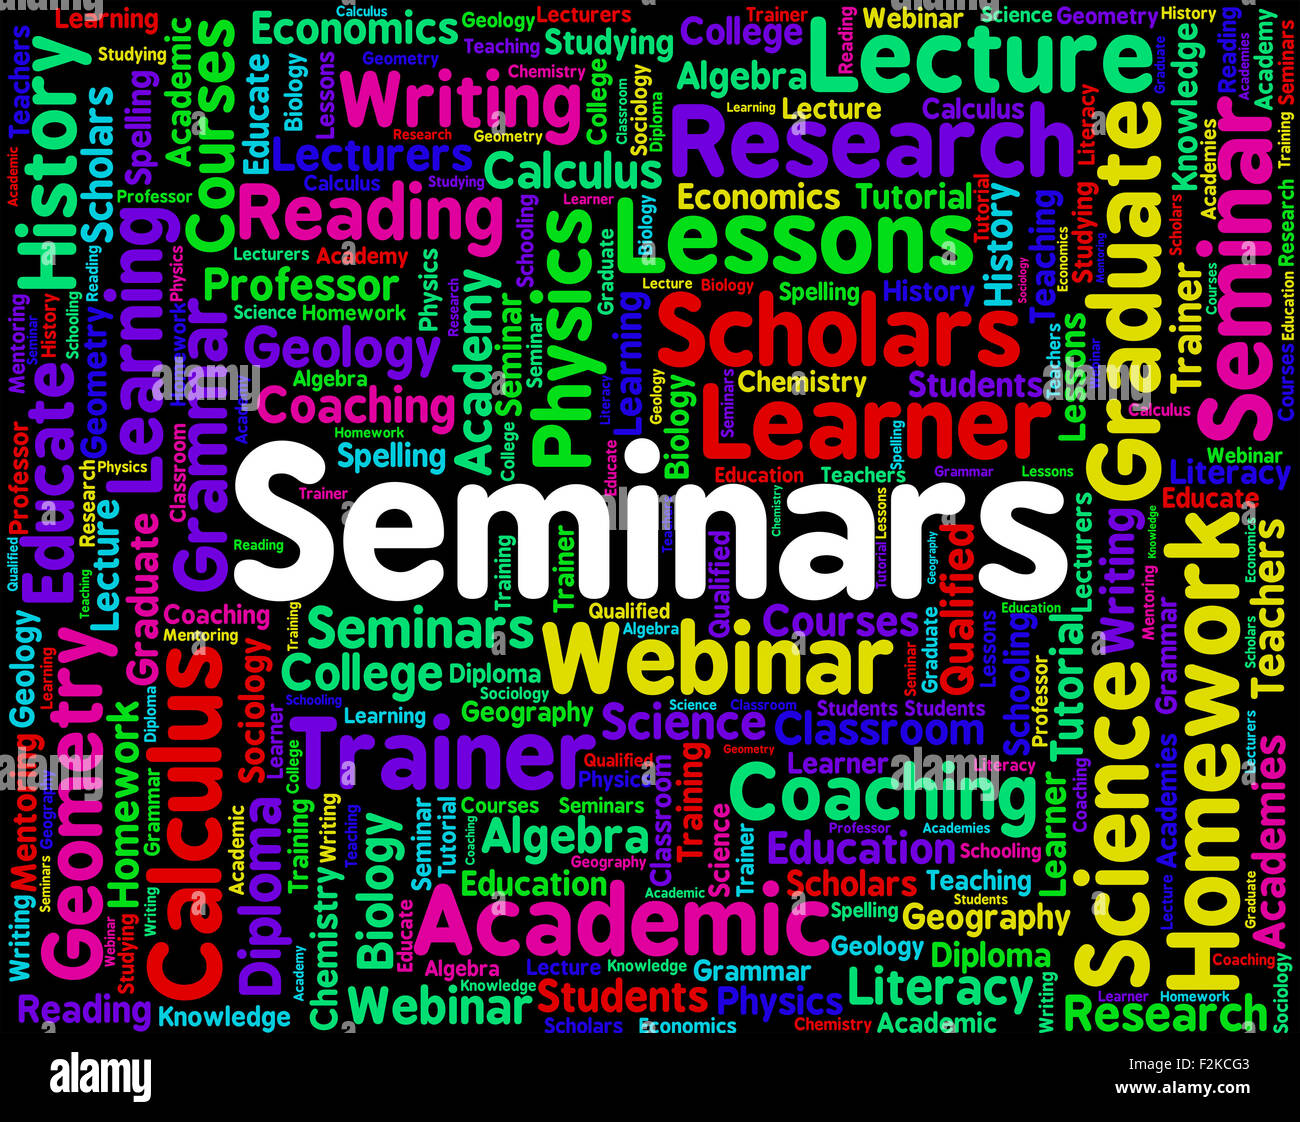 Help writing geology speech microsoft word templates thesis